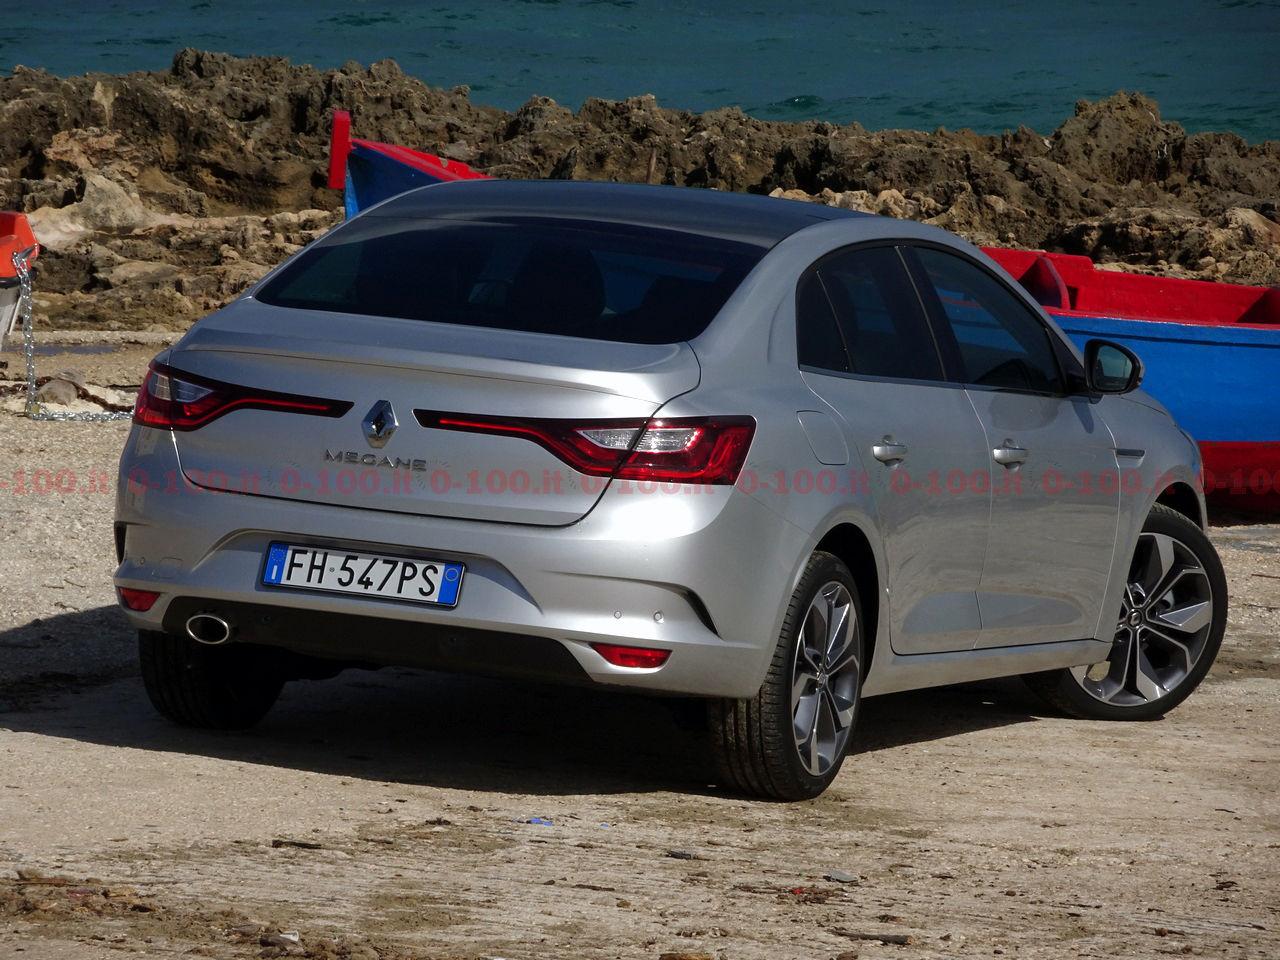 renault-megane-grand-coupe-dci-110-130-cv-test-prova-impressioni_0-100_15